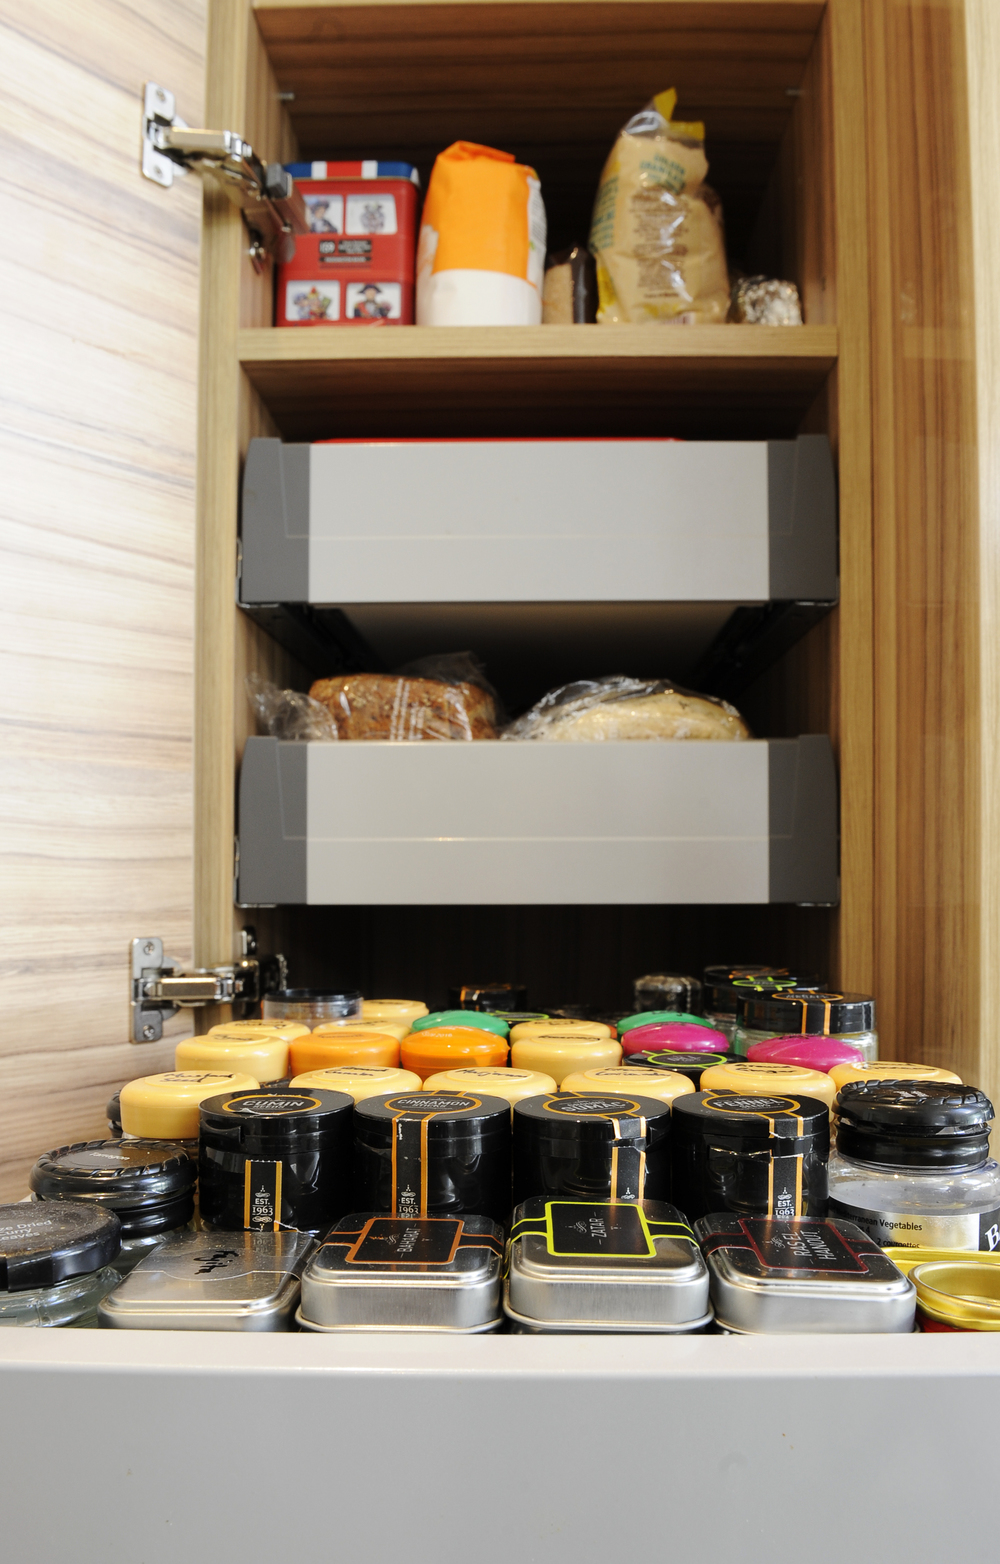 Store cupboard essentials provide versatility.